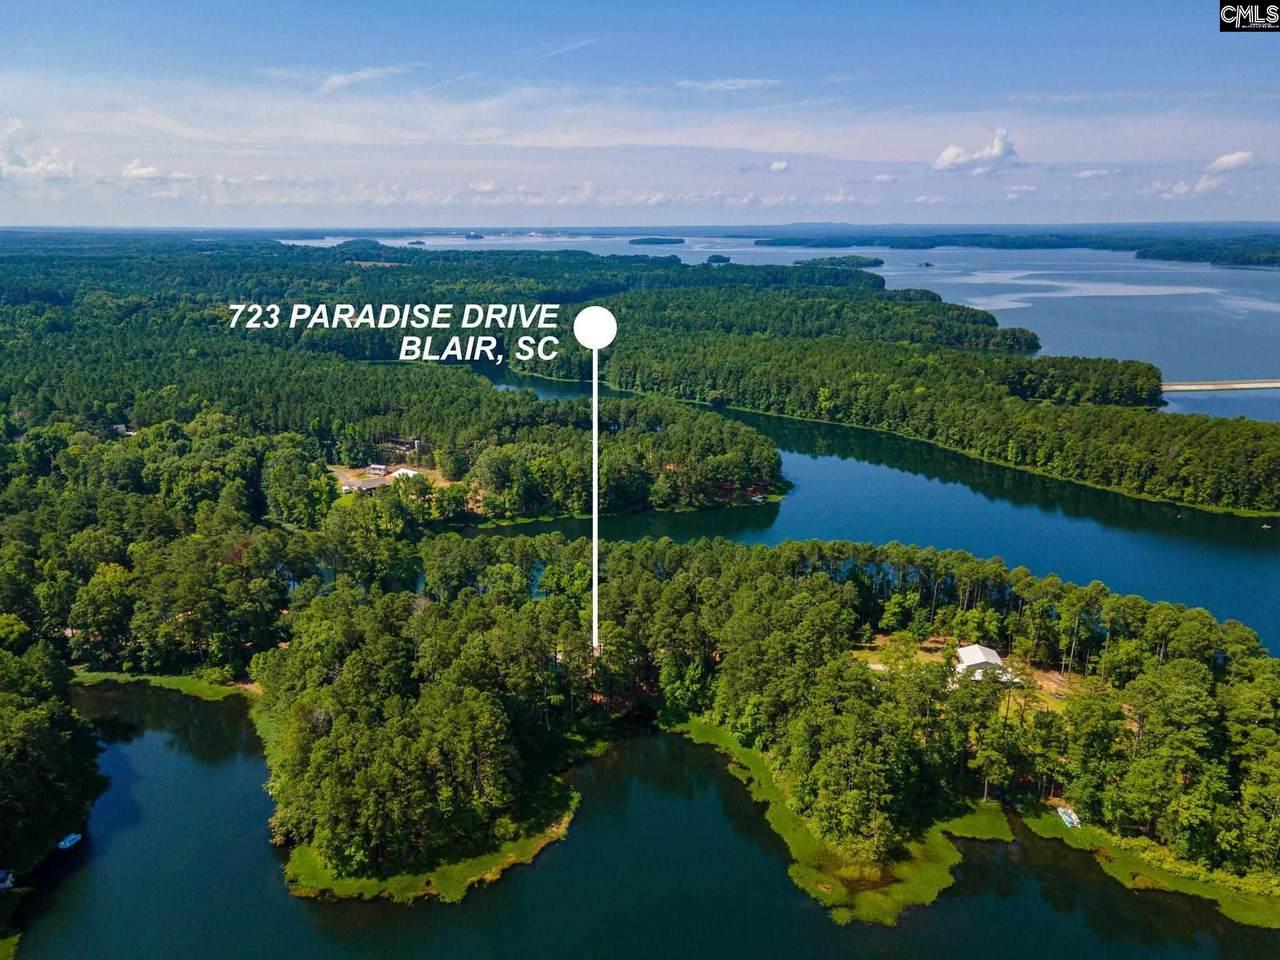 723 Paradise Drive - Photo 1